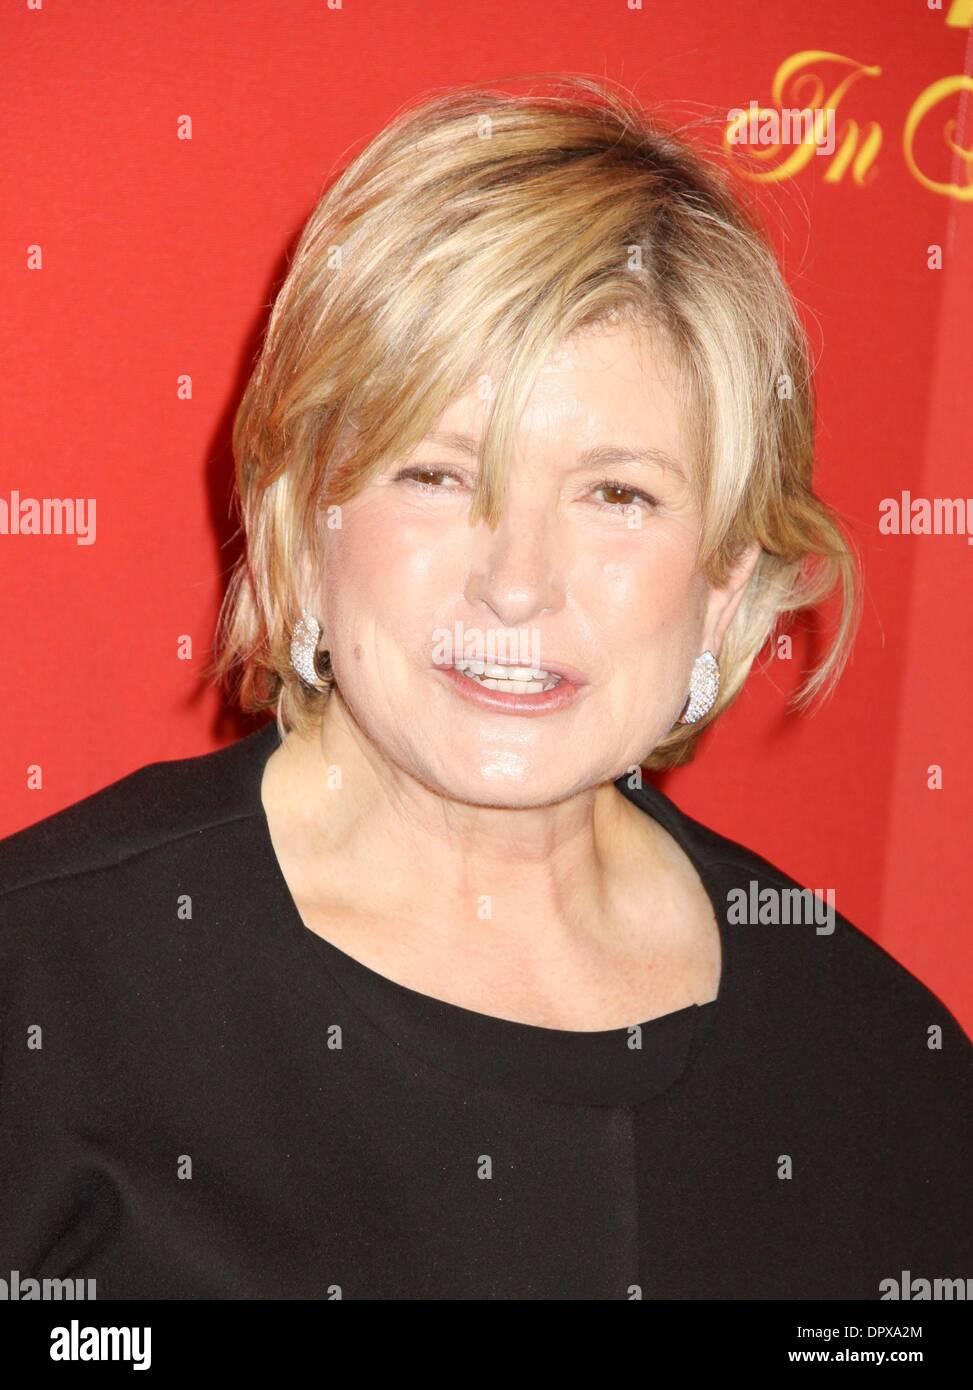 Martha Stewart (actress) nudes (52 photos), fotos Porno, iCloud, cleavage 2016